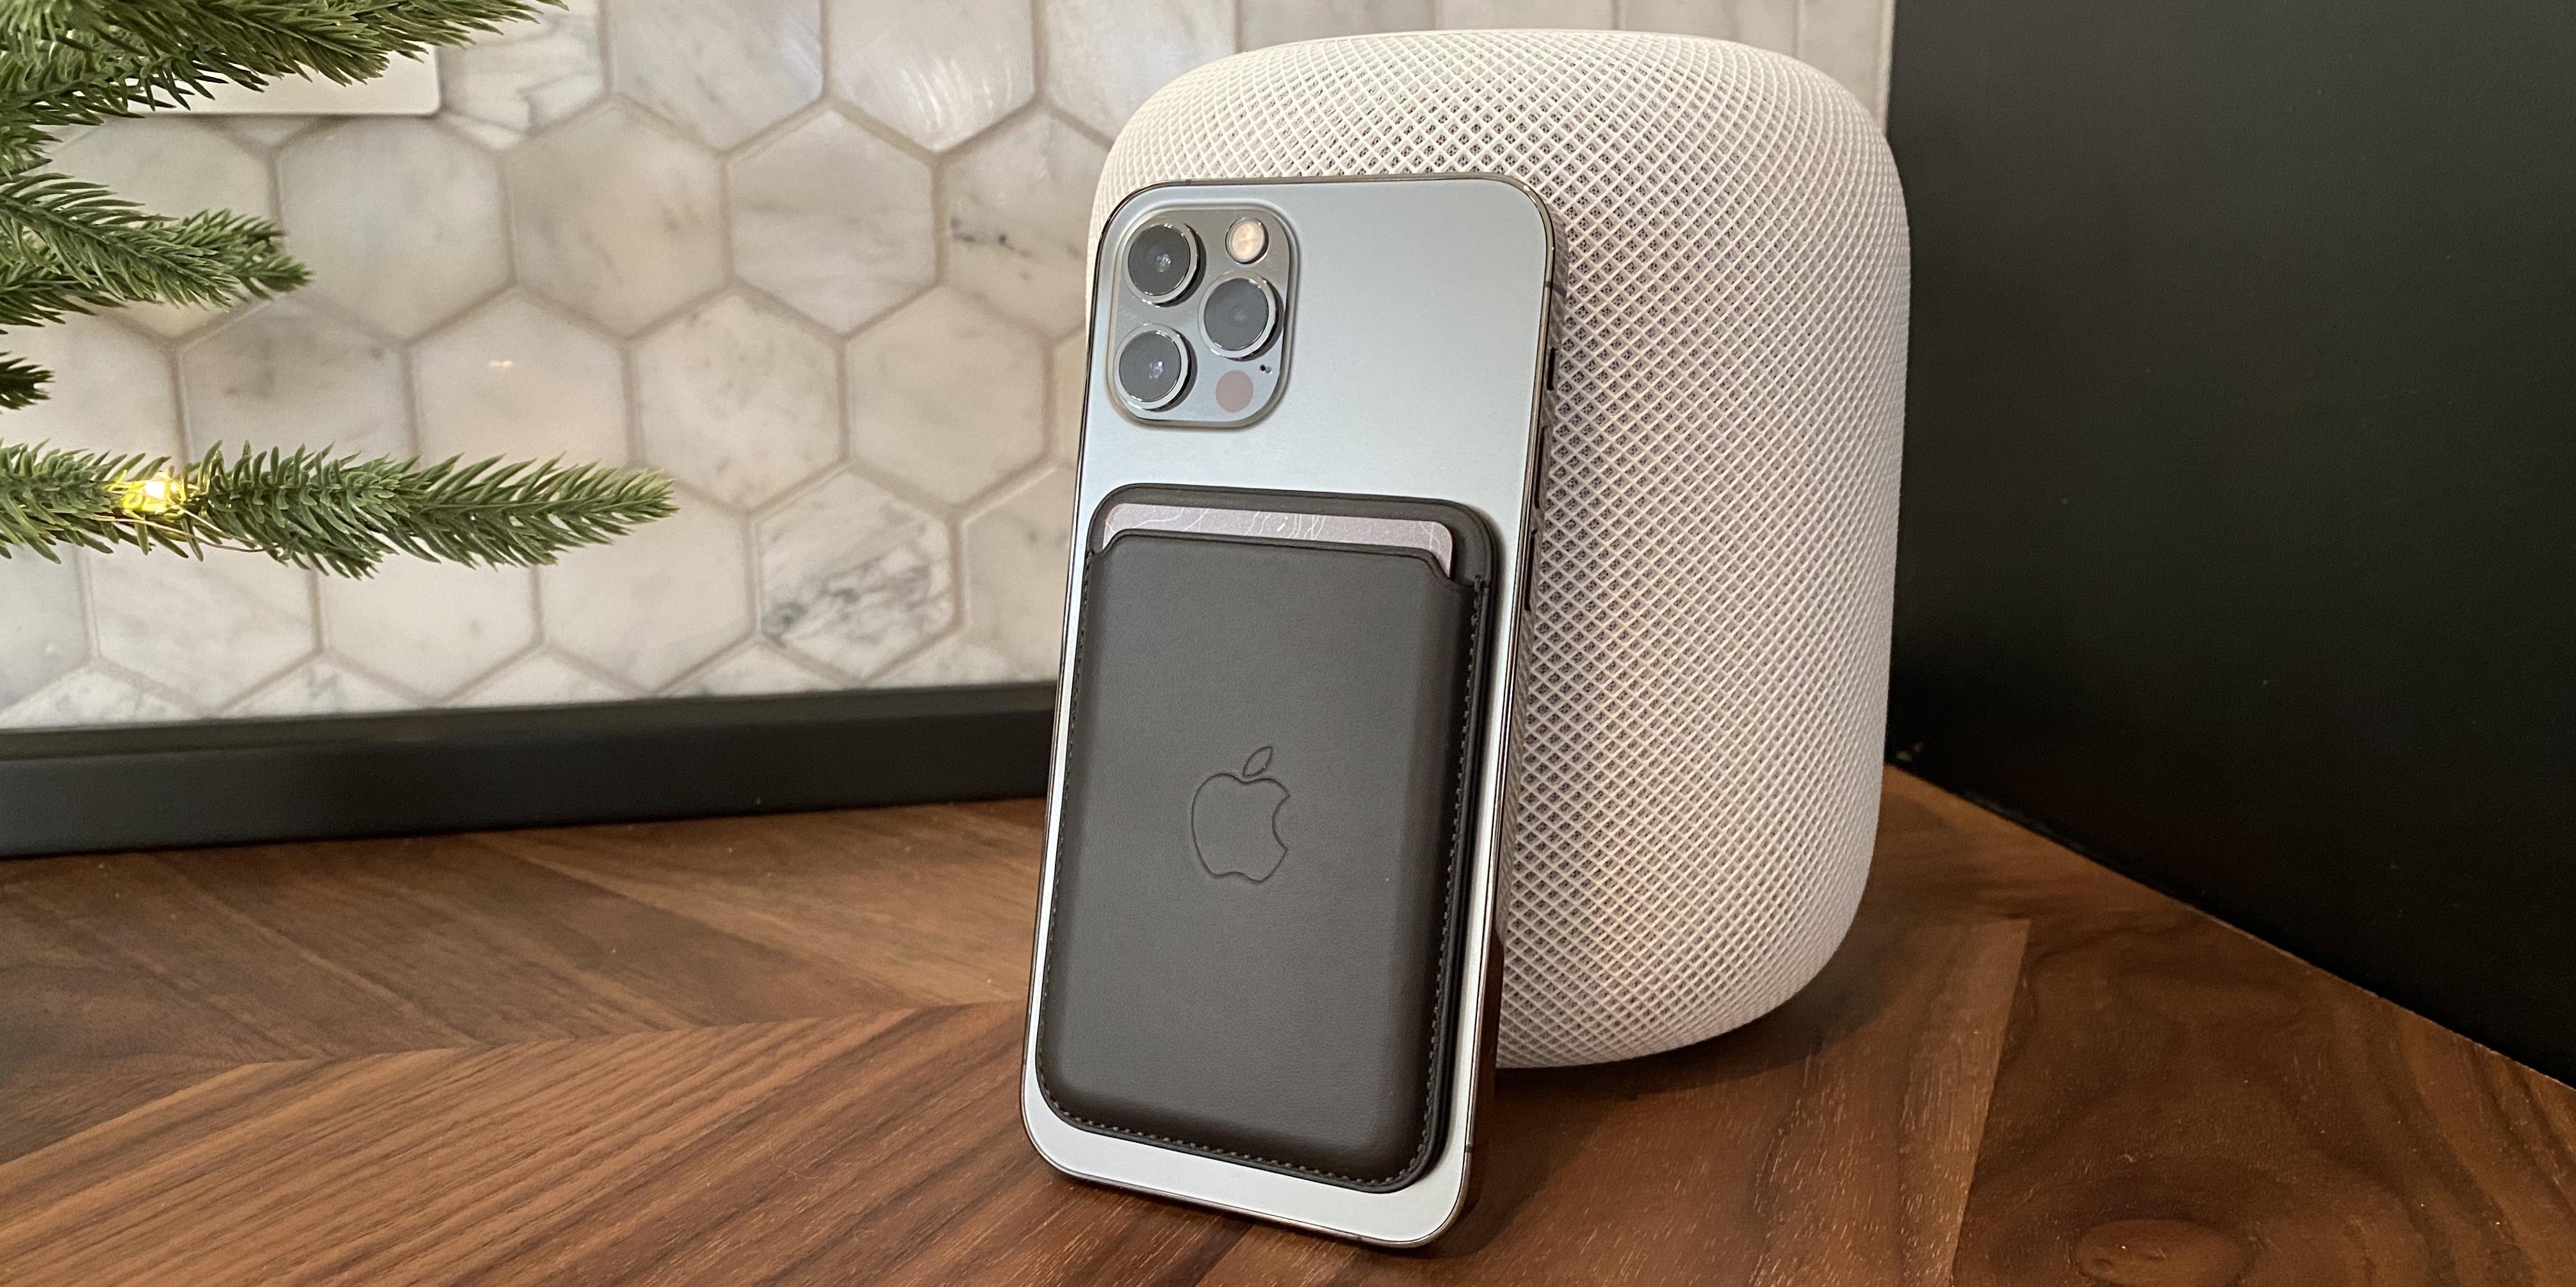 iPhone wallets gift guide smart wallets Apple Leather wallet